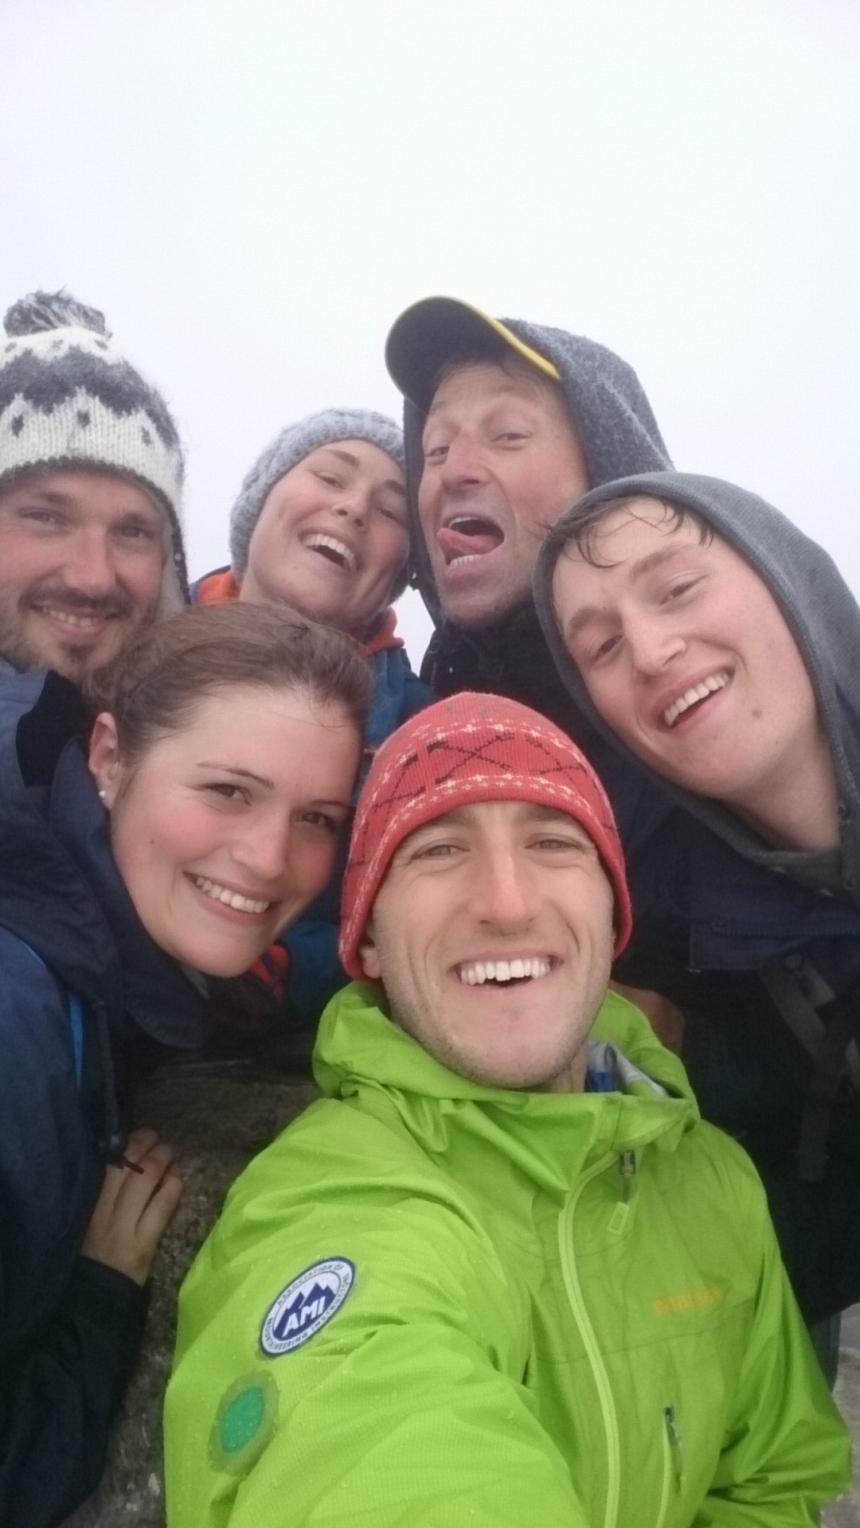 Ben Nevis summit selfie!